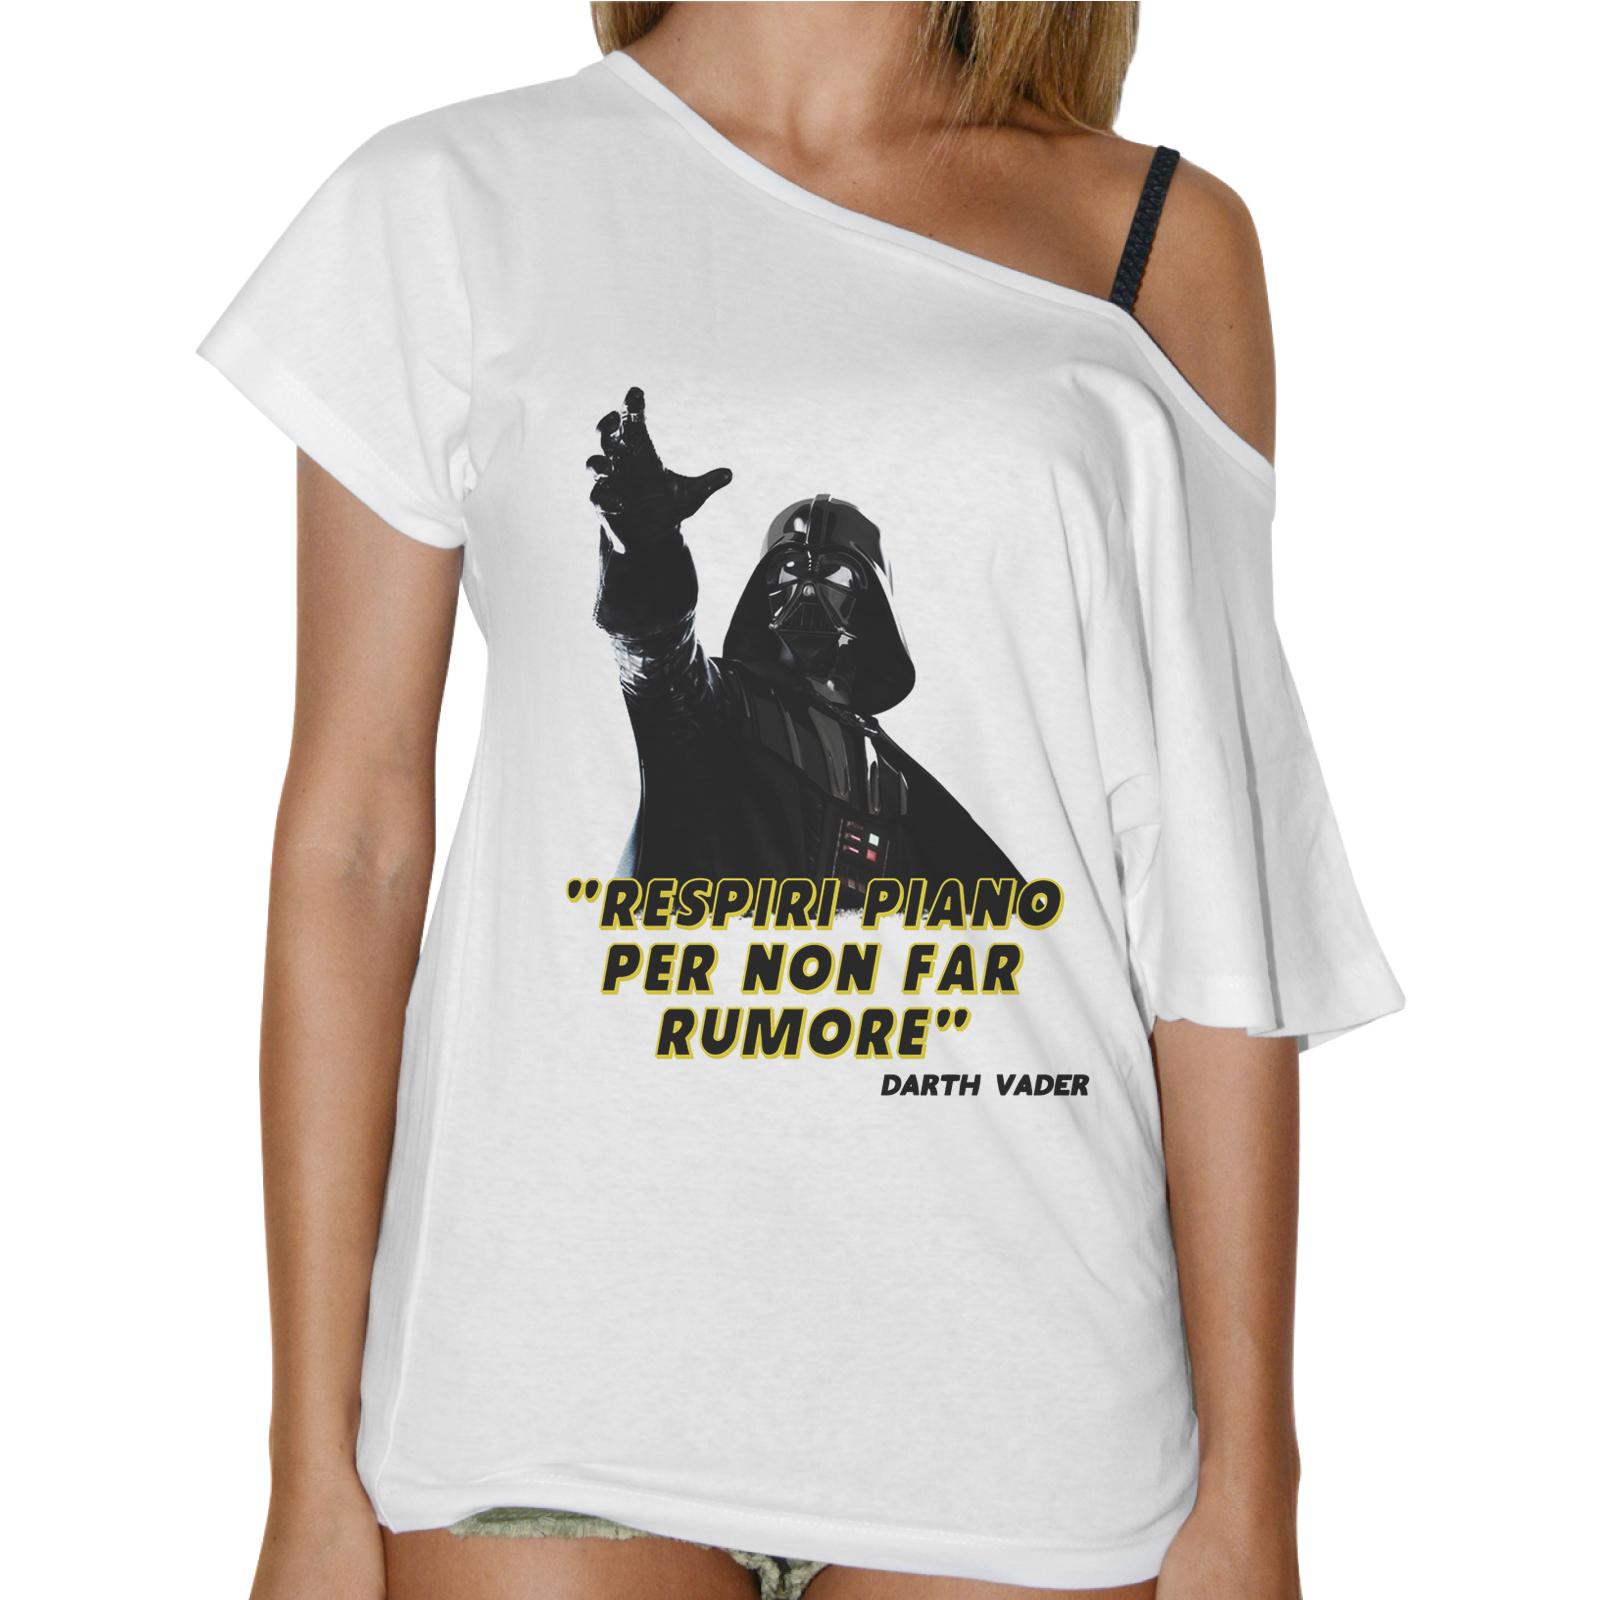 T-Shirt Donna Collo Barca RESPIRI PIANO 1